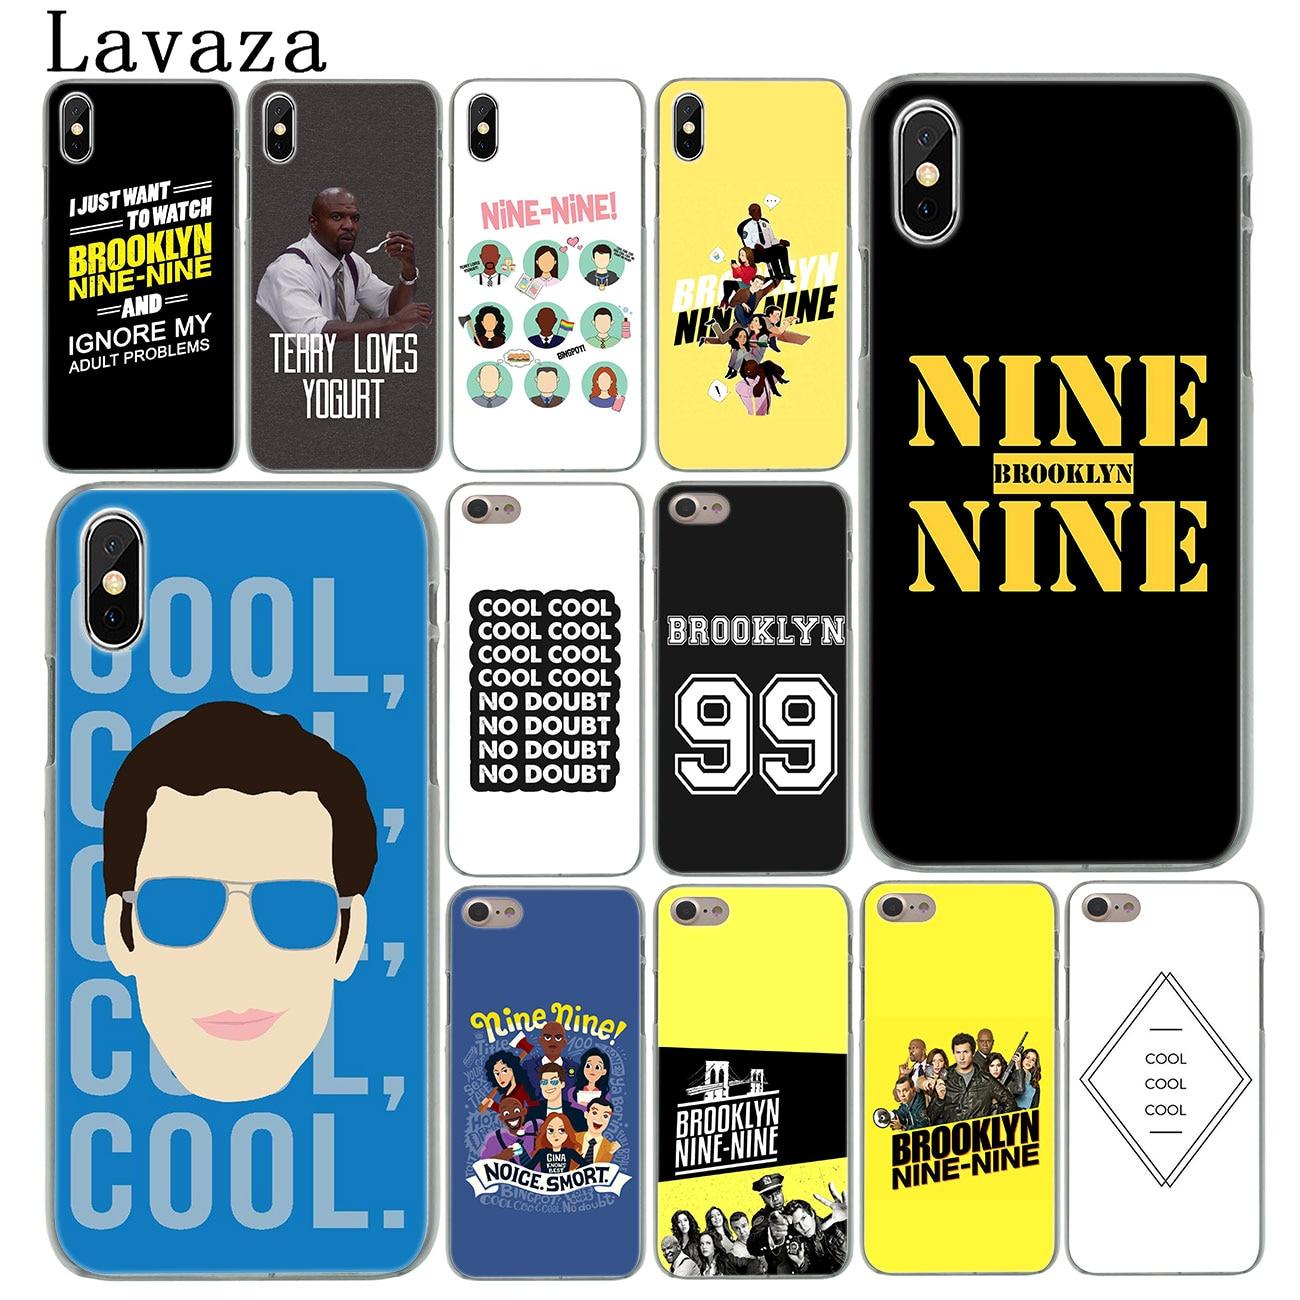 Lavaza Brooklyn Nine Nine Hard Cover Case for iPhone X XS Max XR 6 6S 7 8 Plus 5 5S SE 5C 4S 10 Phone Cases 7Plus 8Plus